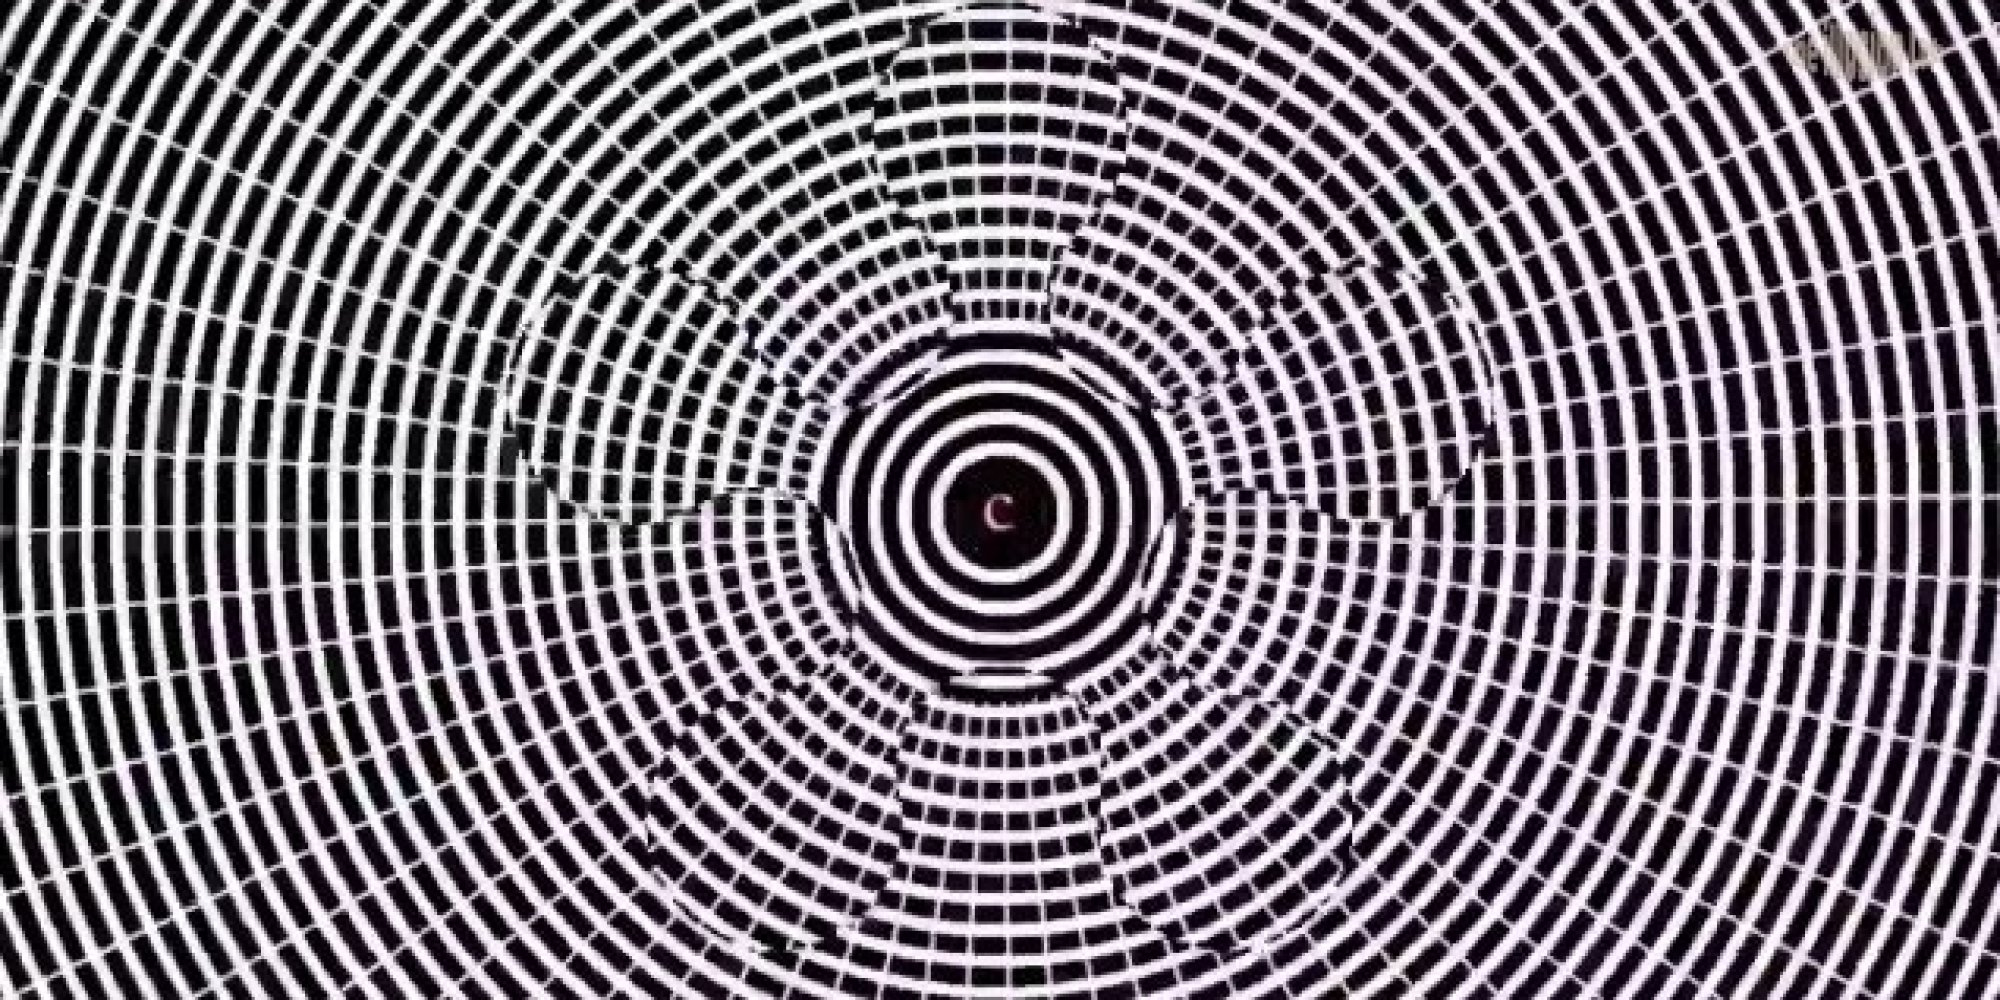 Photos illusion car moving optical illusion spectacular optical - Photos Illusion Car Moving Optical Illusion Spectacular Optical 16